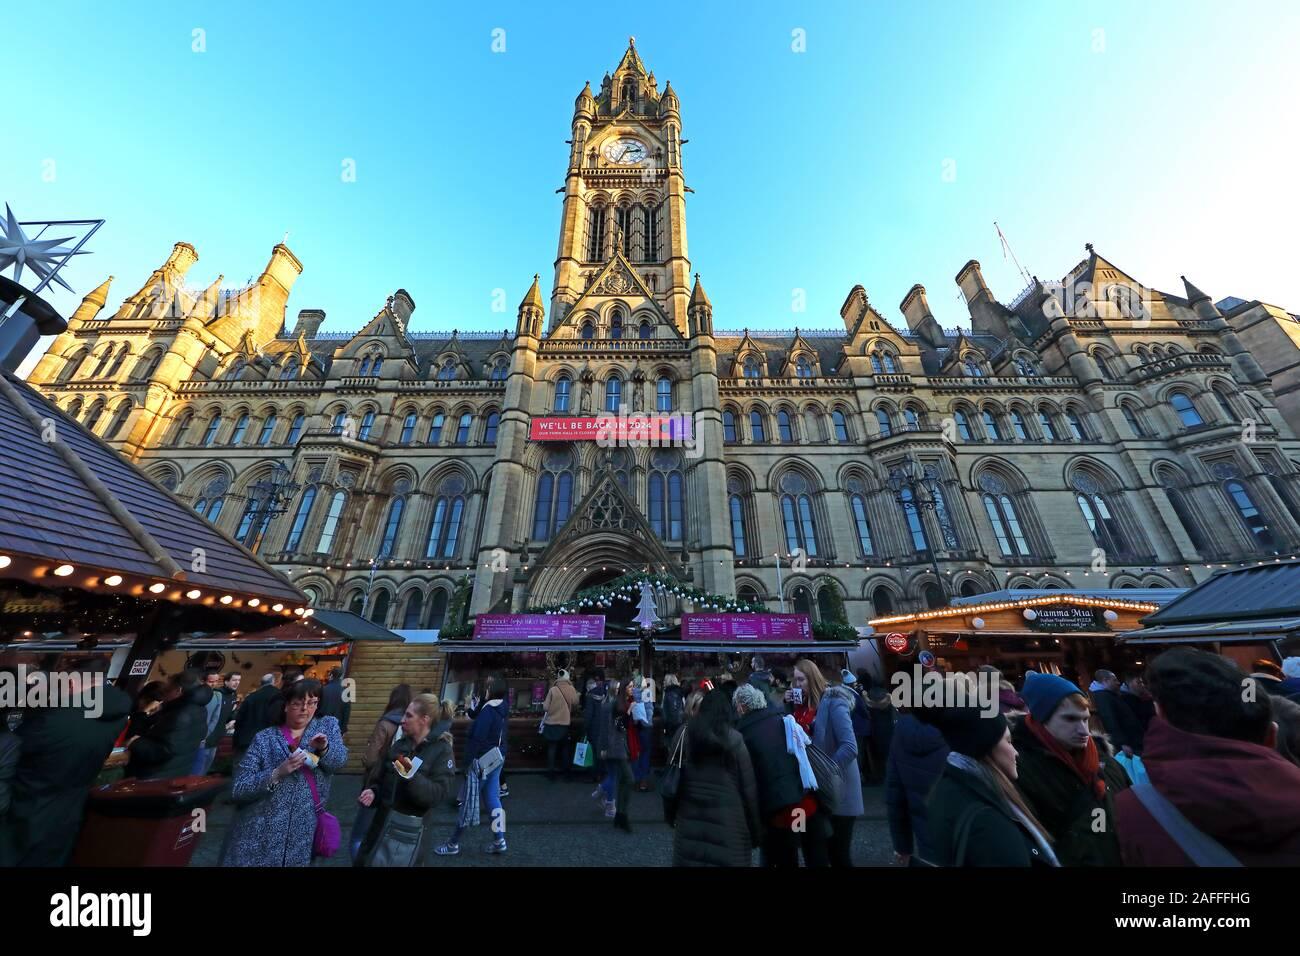 @HotpixUK,HotpixUK,GoTonySmith,@HotpixUk,England,UK,M2 5DB,Xmas Market,Xmas,December,stalls,clock,tower,clocktower,people,crowds,Victorian,Gothic,building,Albert Memorial,stall,bars,pub,bar,shoppers,retail,drinkers,eaters,food,mulled wine,Greater Manchester